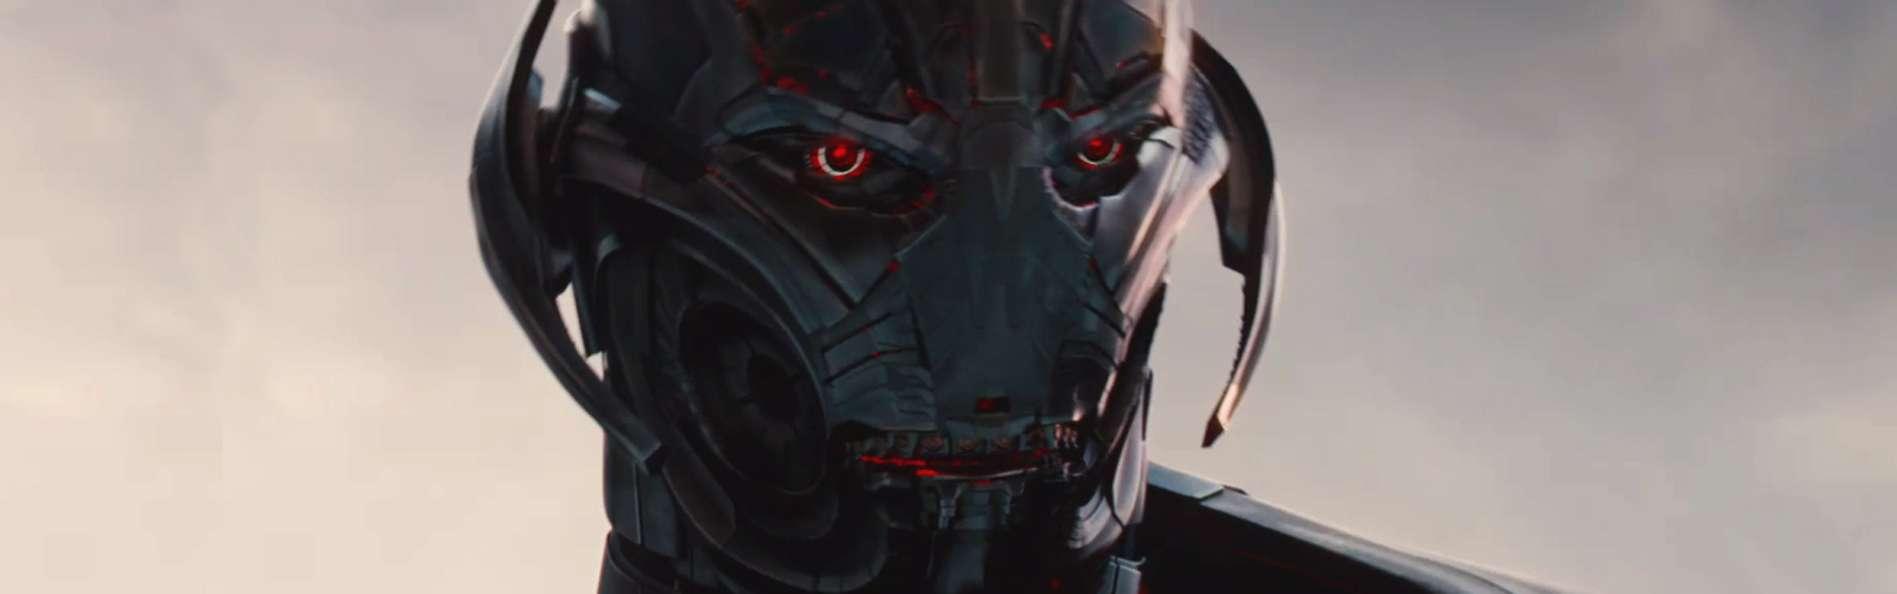 'Avengers: Age of Ultron'. Foto: Marvel Studios